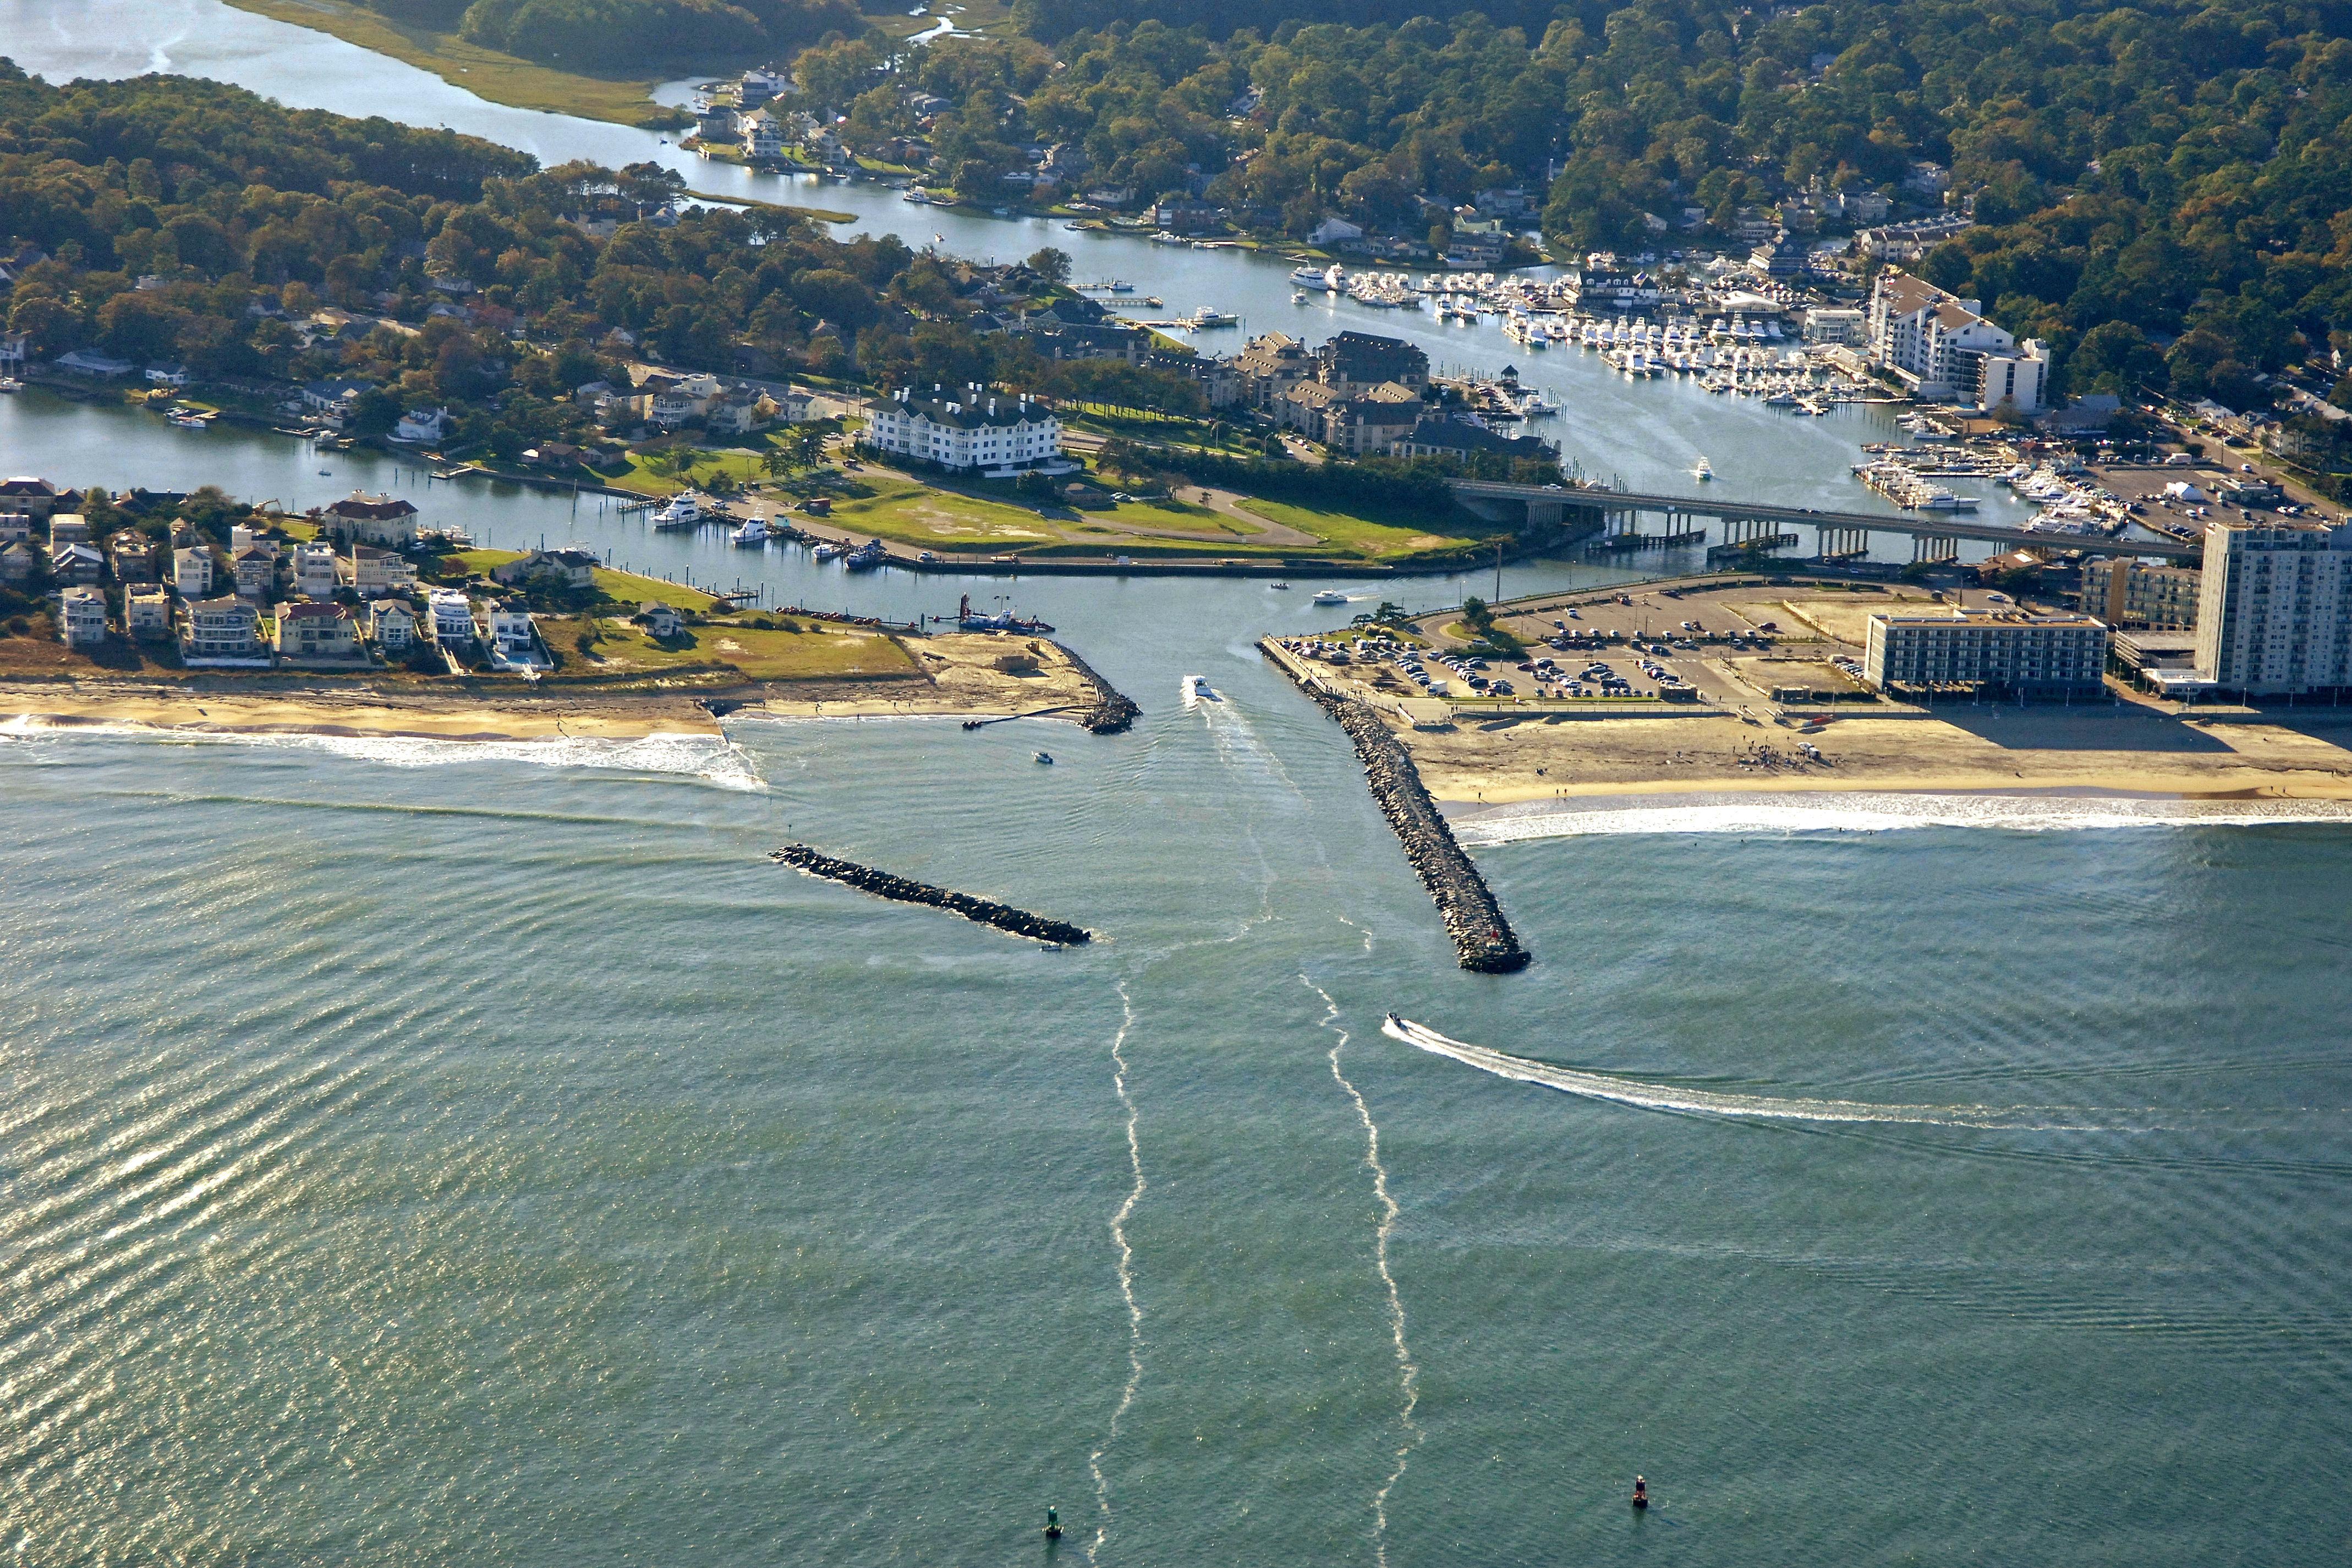 Lake rudee harbor in lake view va united states harbor for Rudee inlet fishing